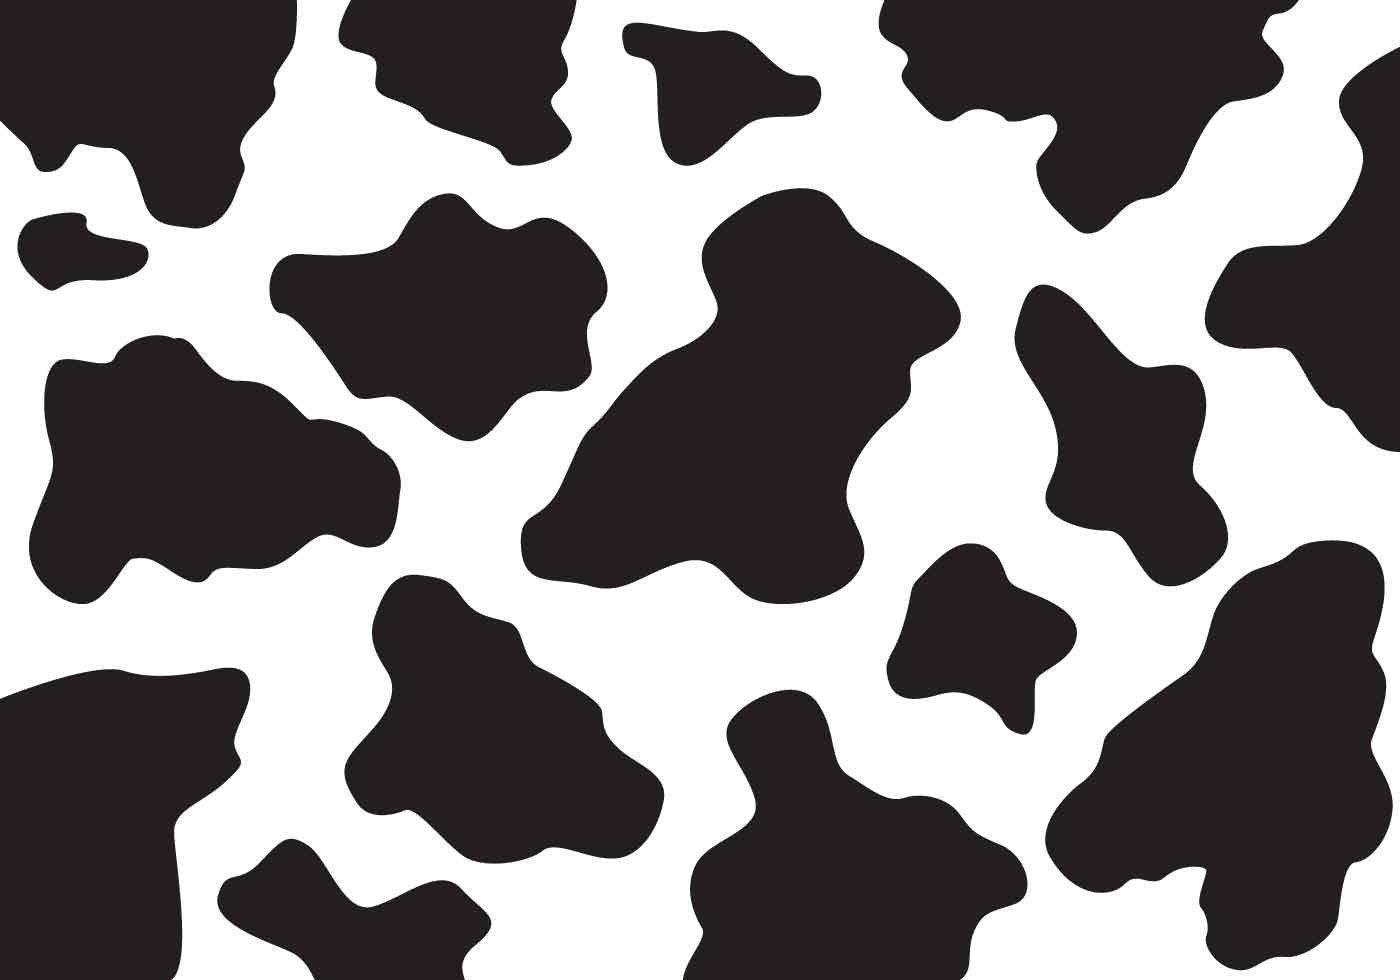 Cow Print Pc Wallpaper In 2020 Desktop Wallpaper Art Computer Wallpaper Desktop Wallpapers Laptop Wallpaper